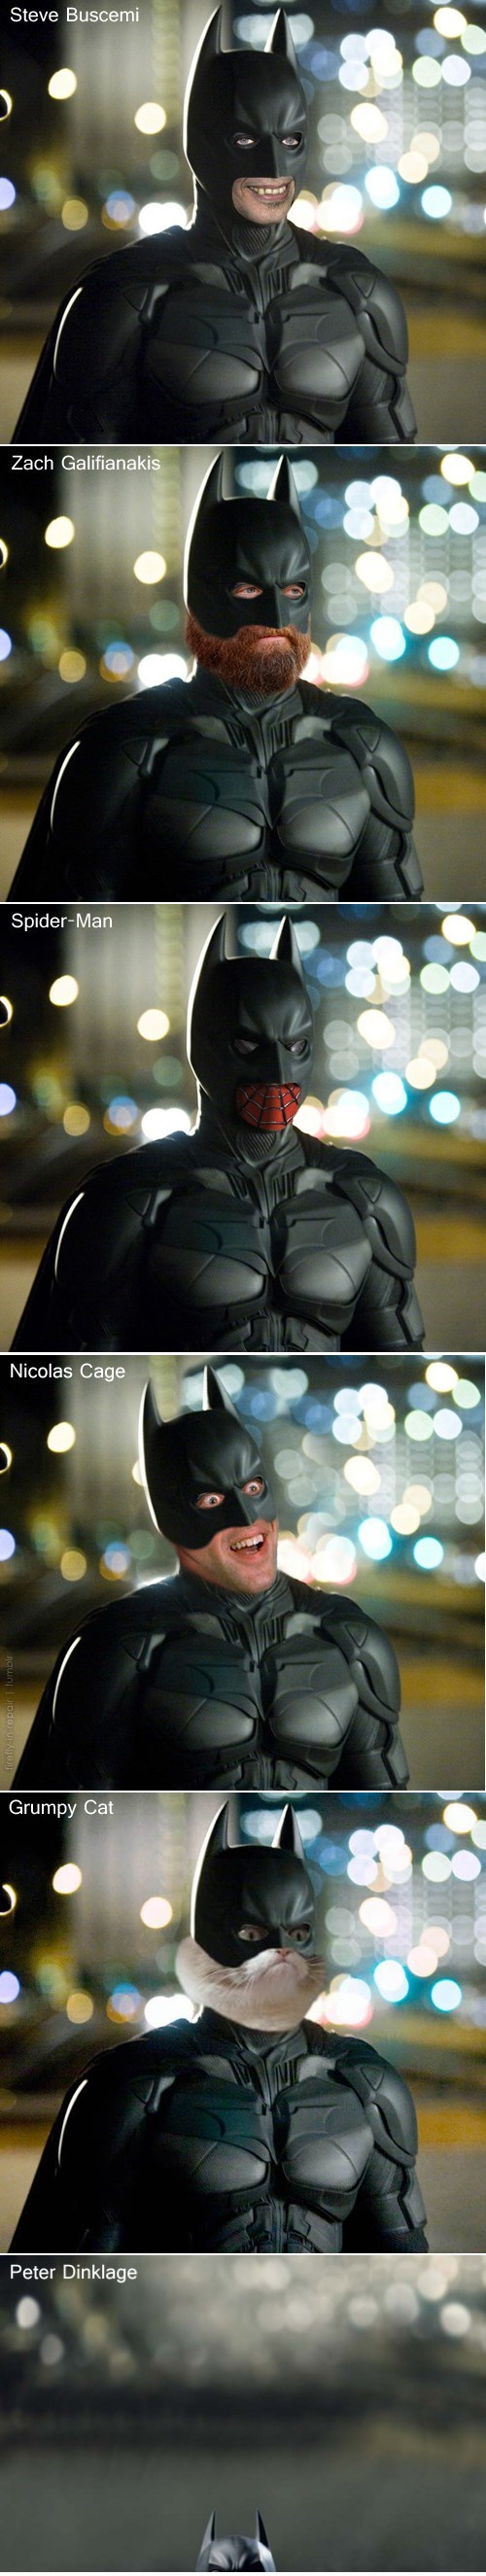 Grumpy Cat batfleck steve buscemi Zach Galifianakis nicolas cage batman peter dinklage - 7764876800